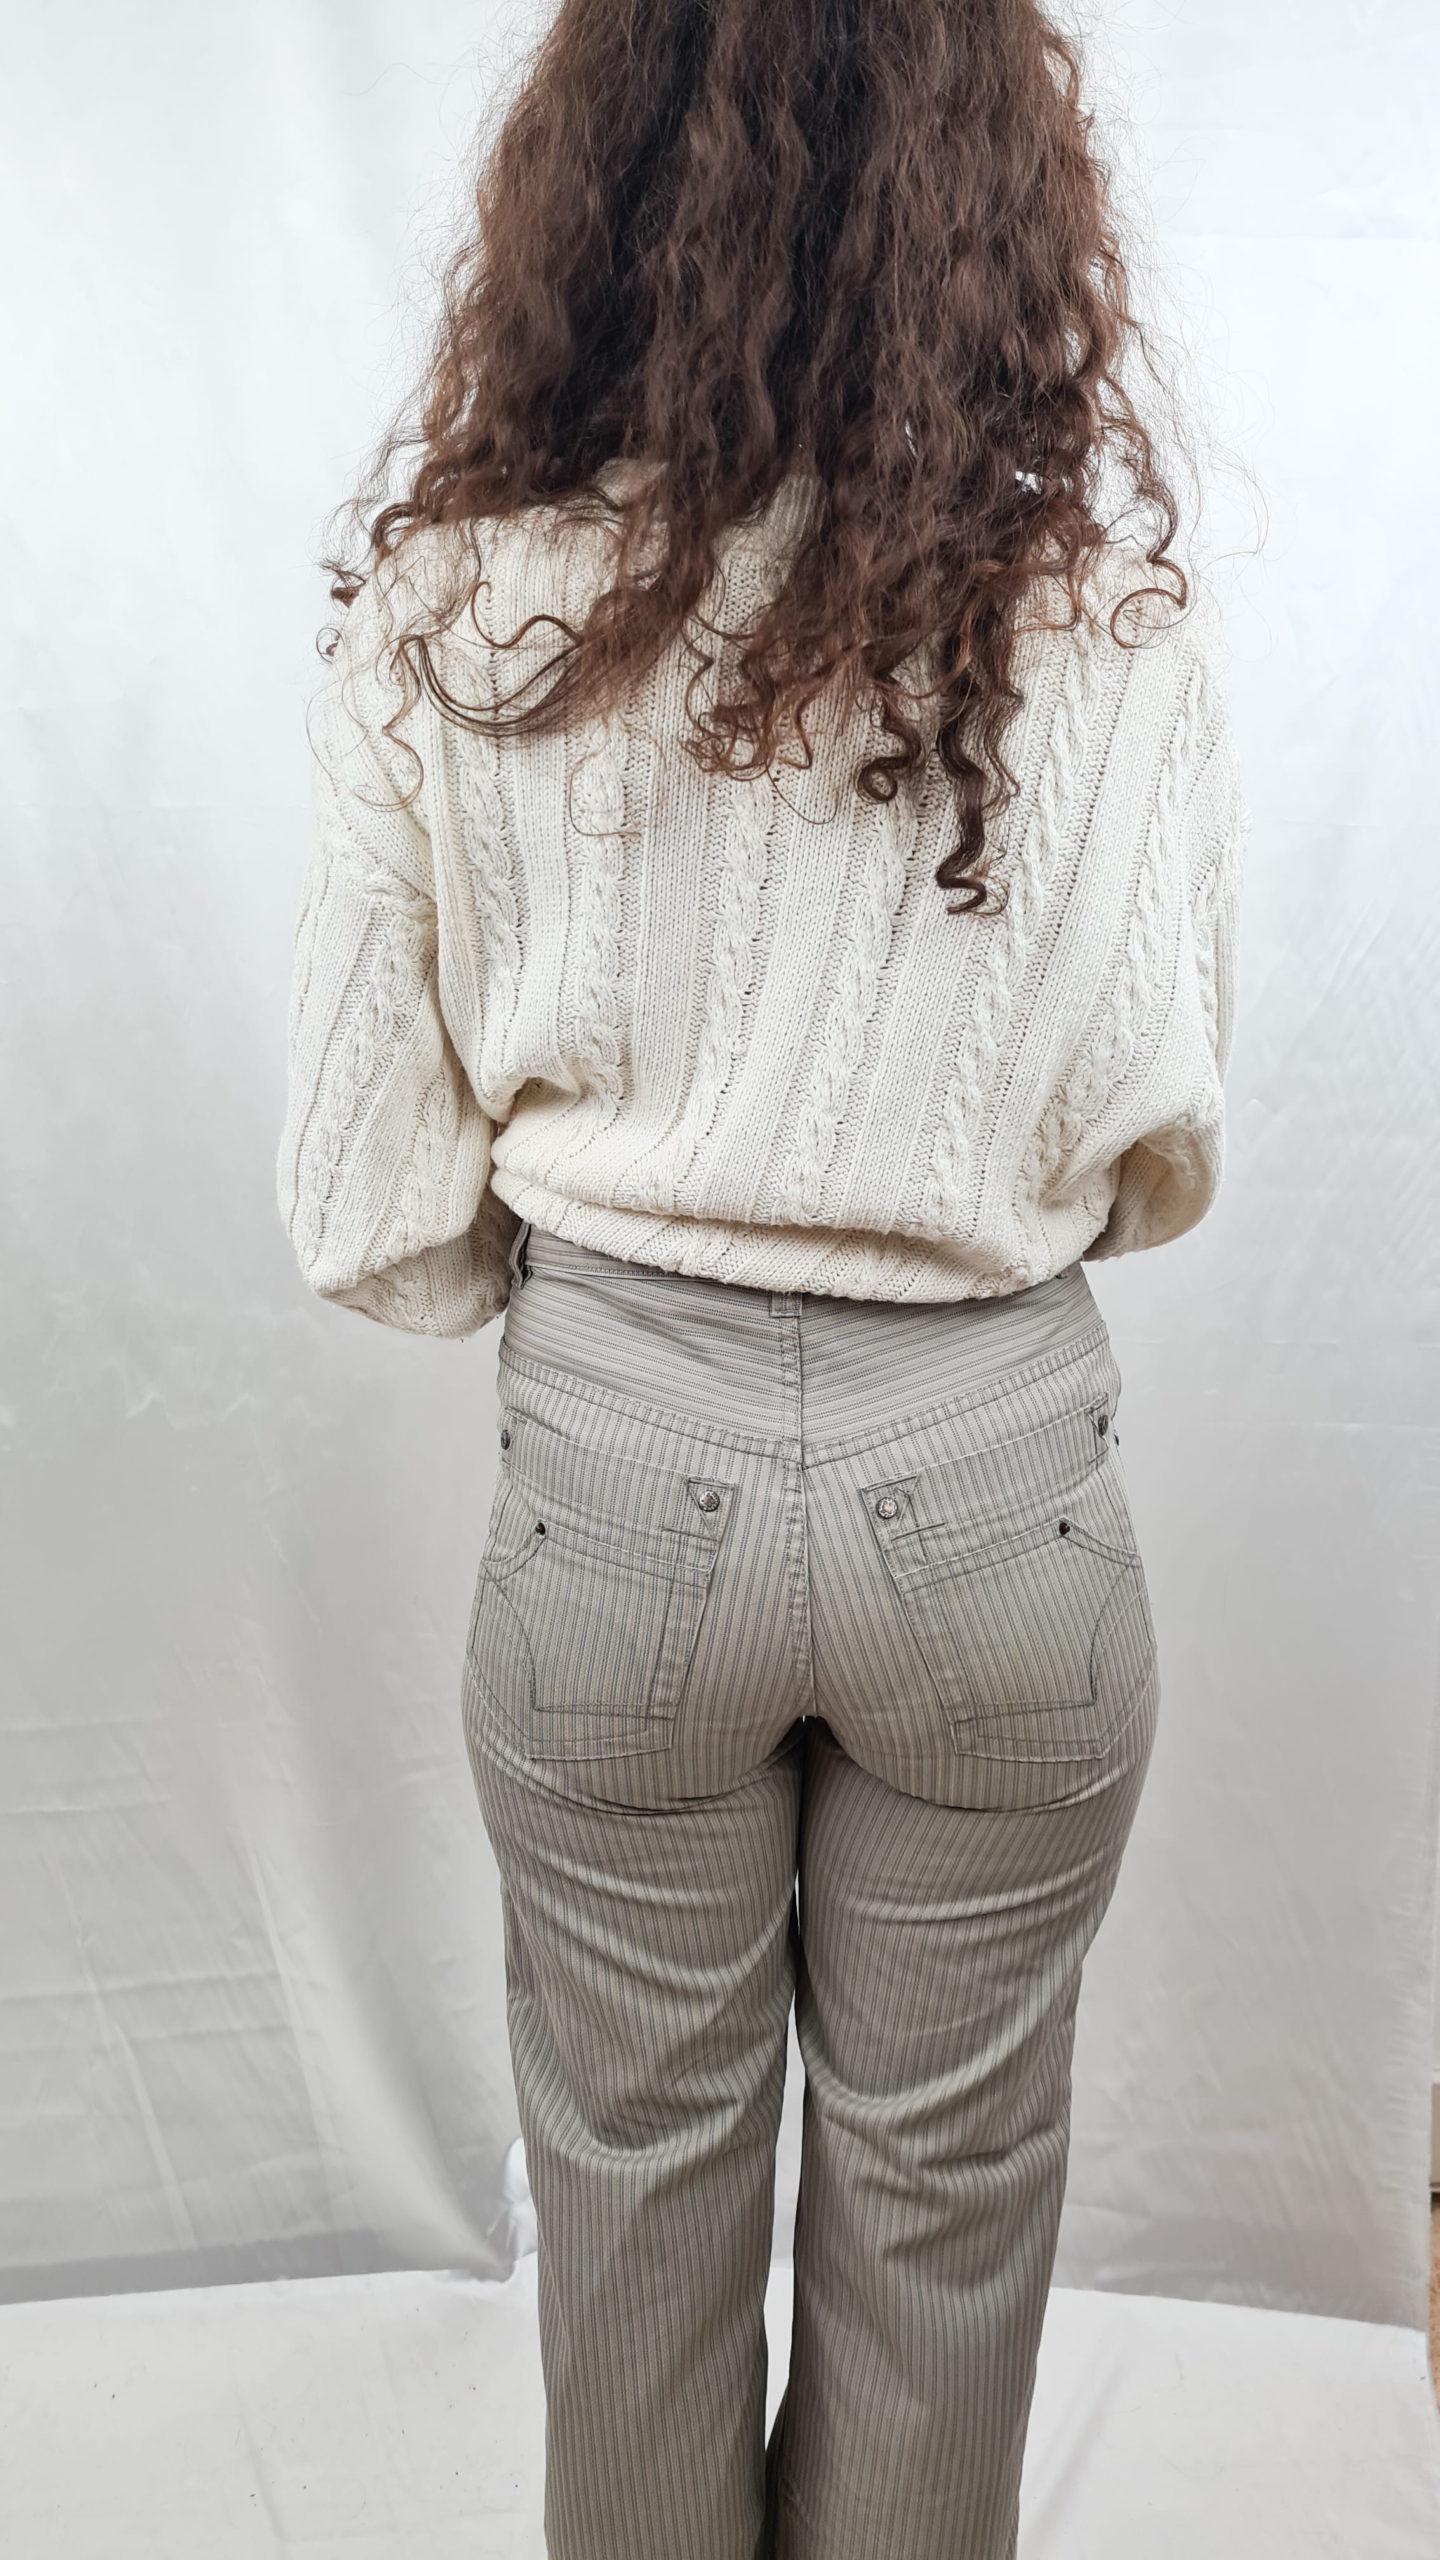 pantalon beige rayé droit (3)